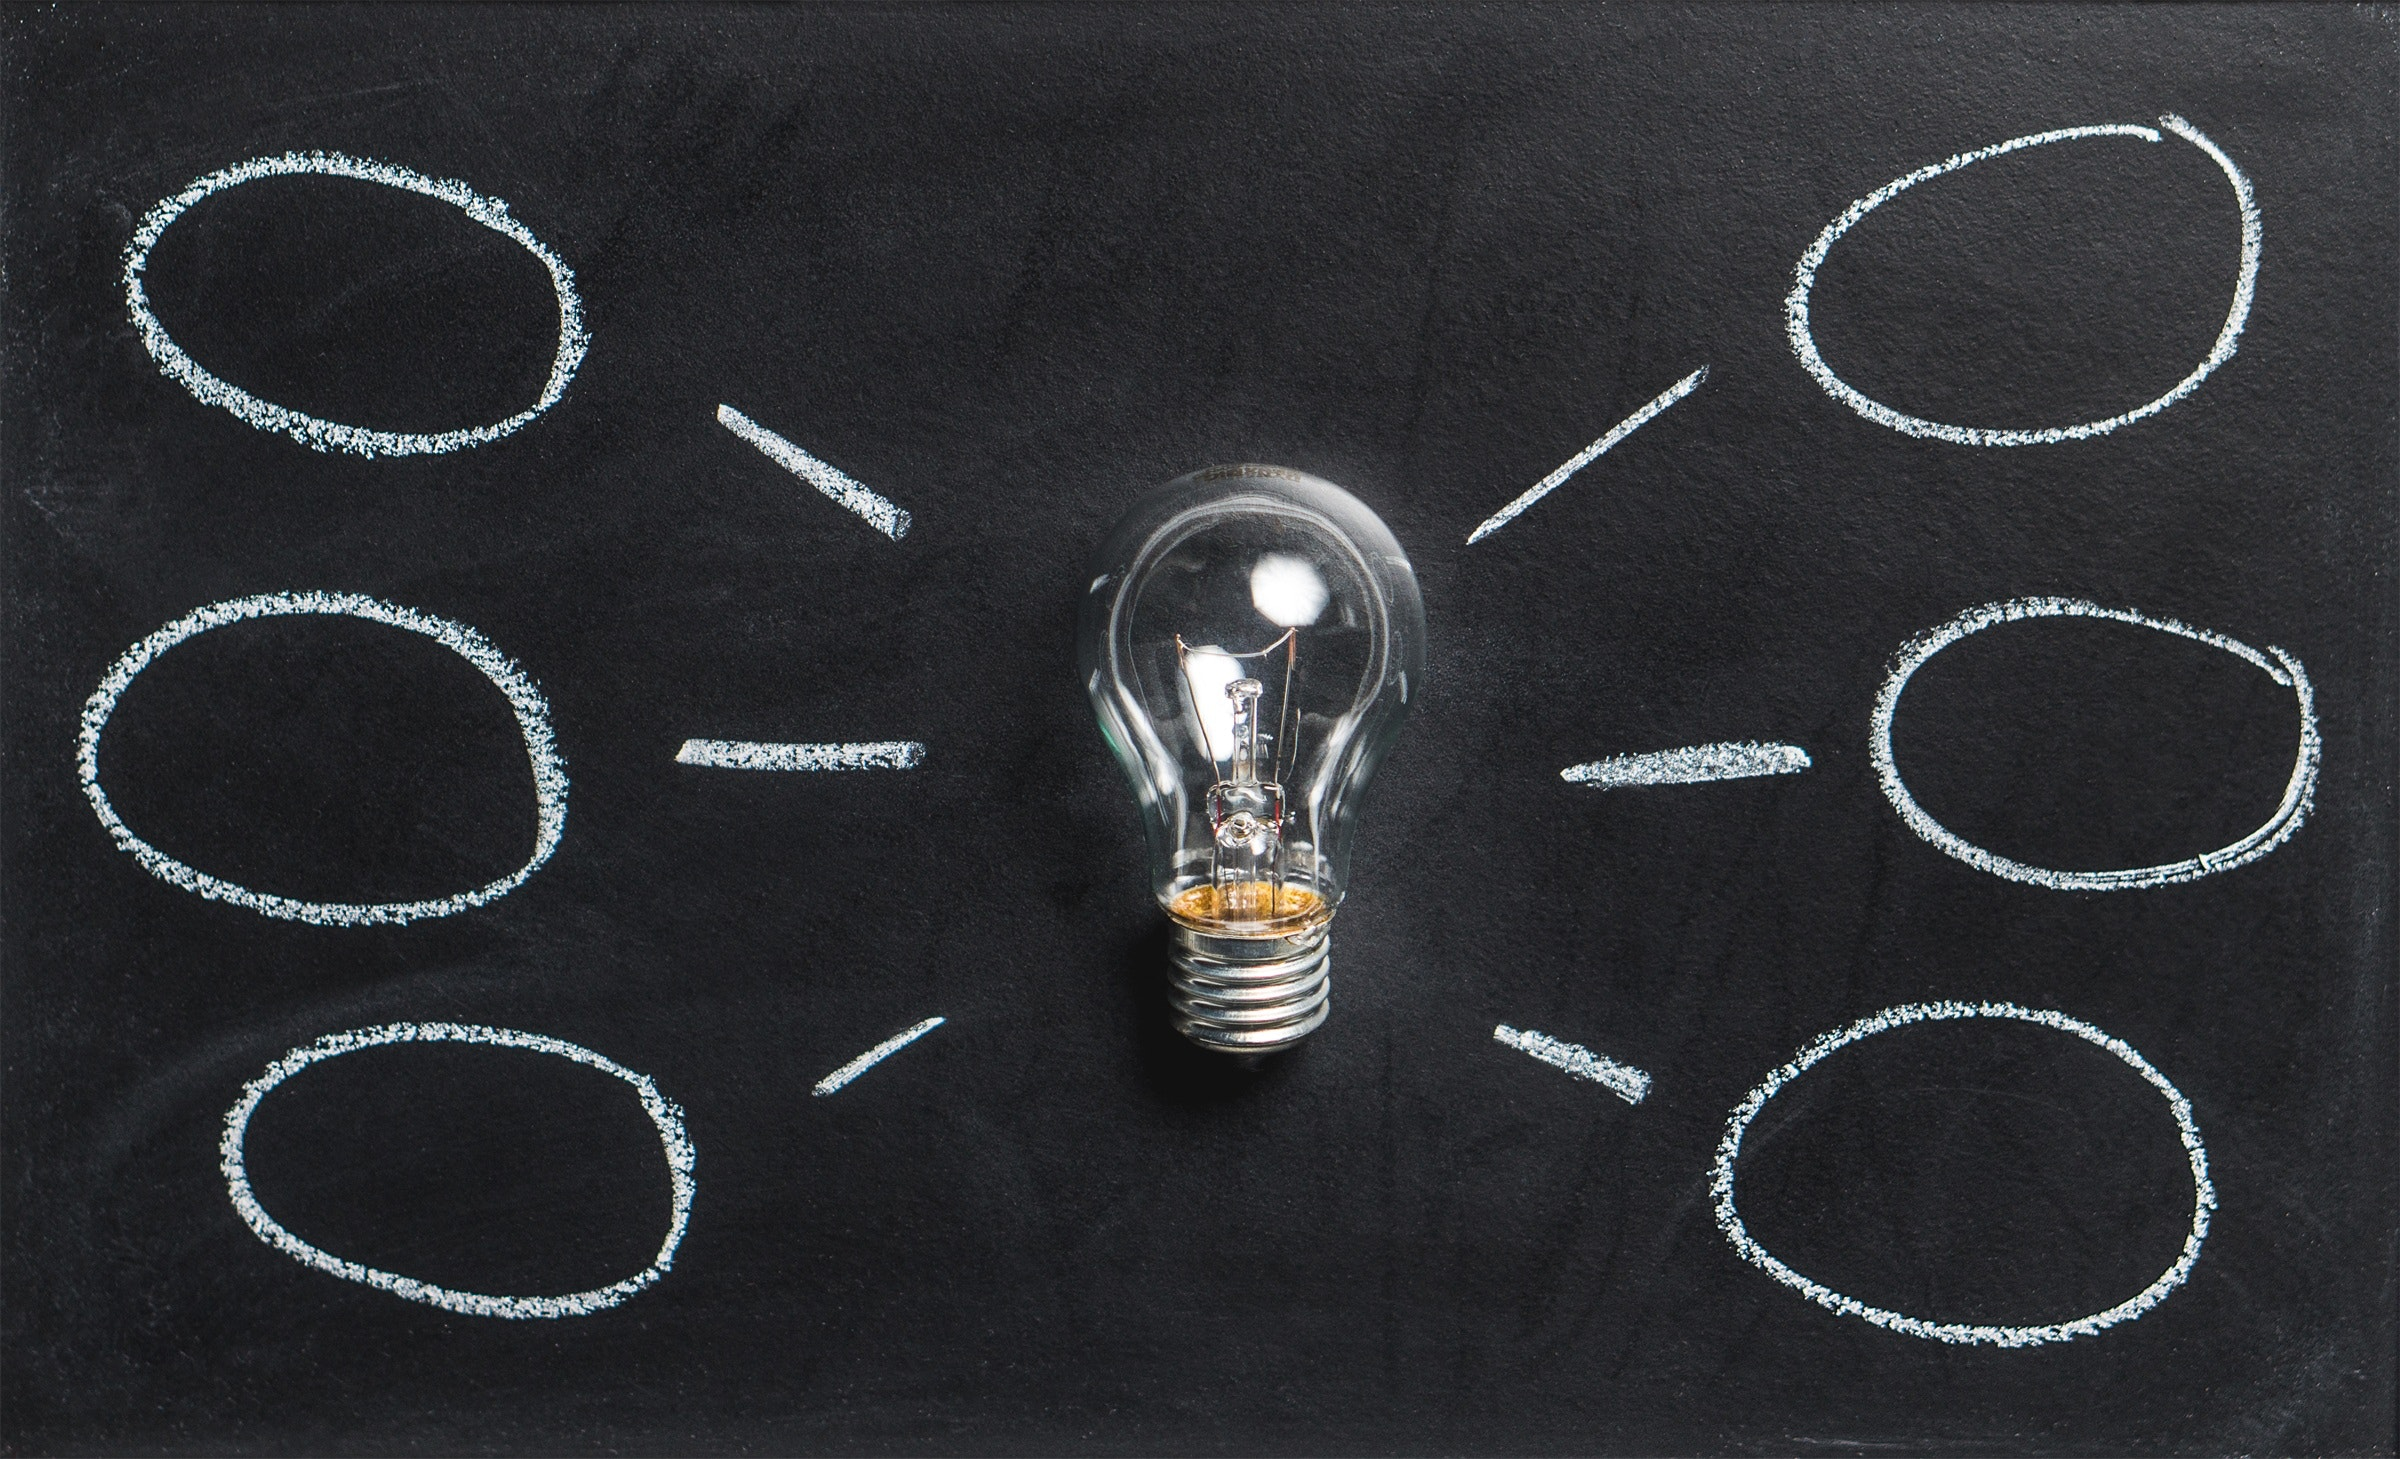 Het groeiende belang van creativiteit